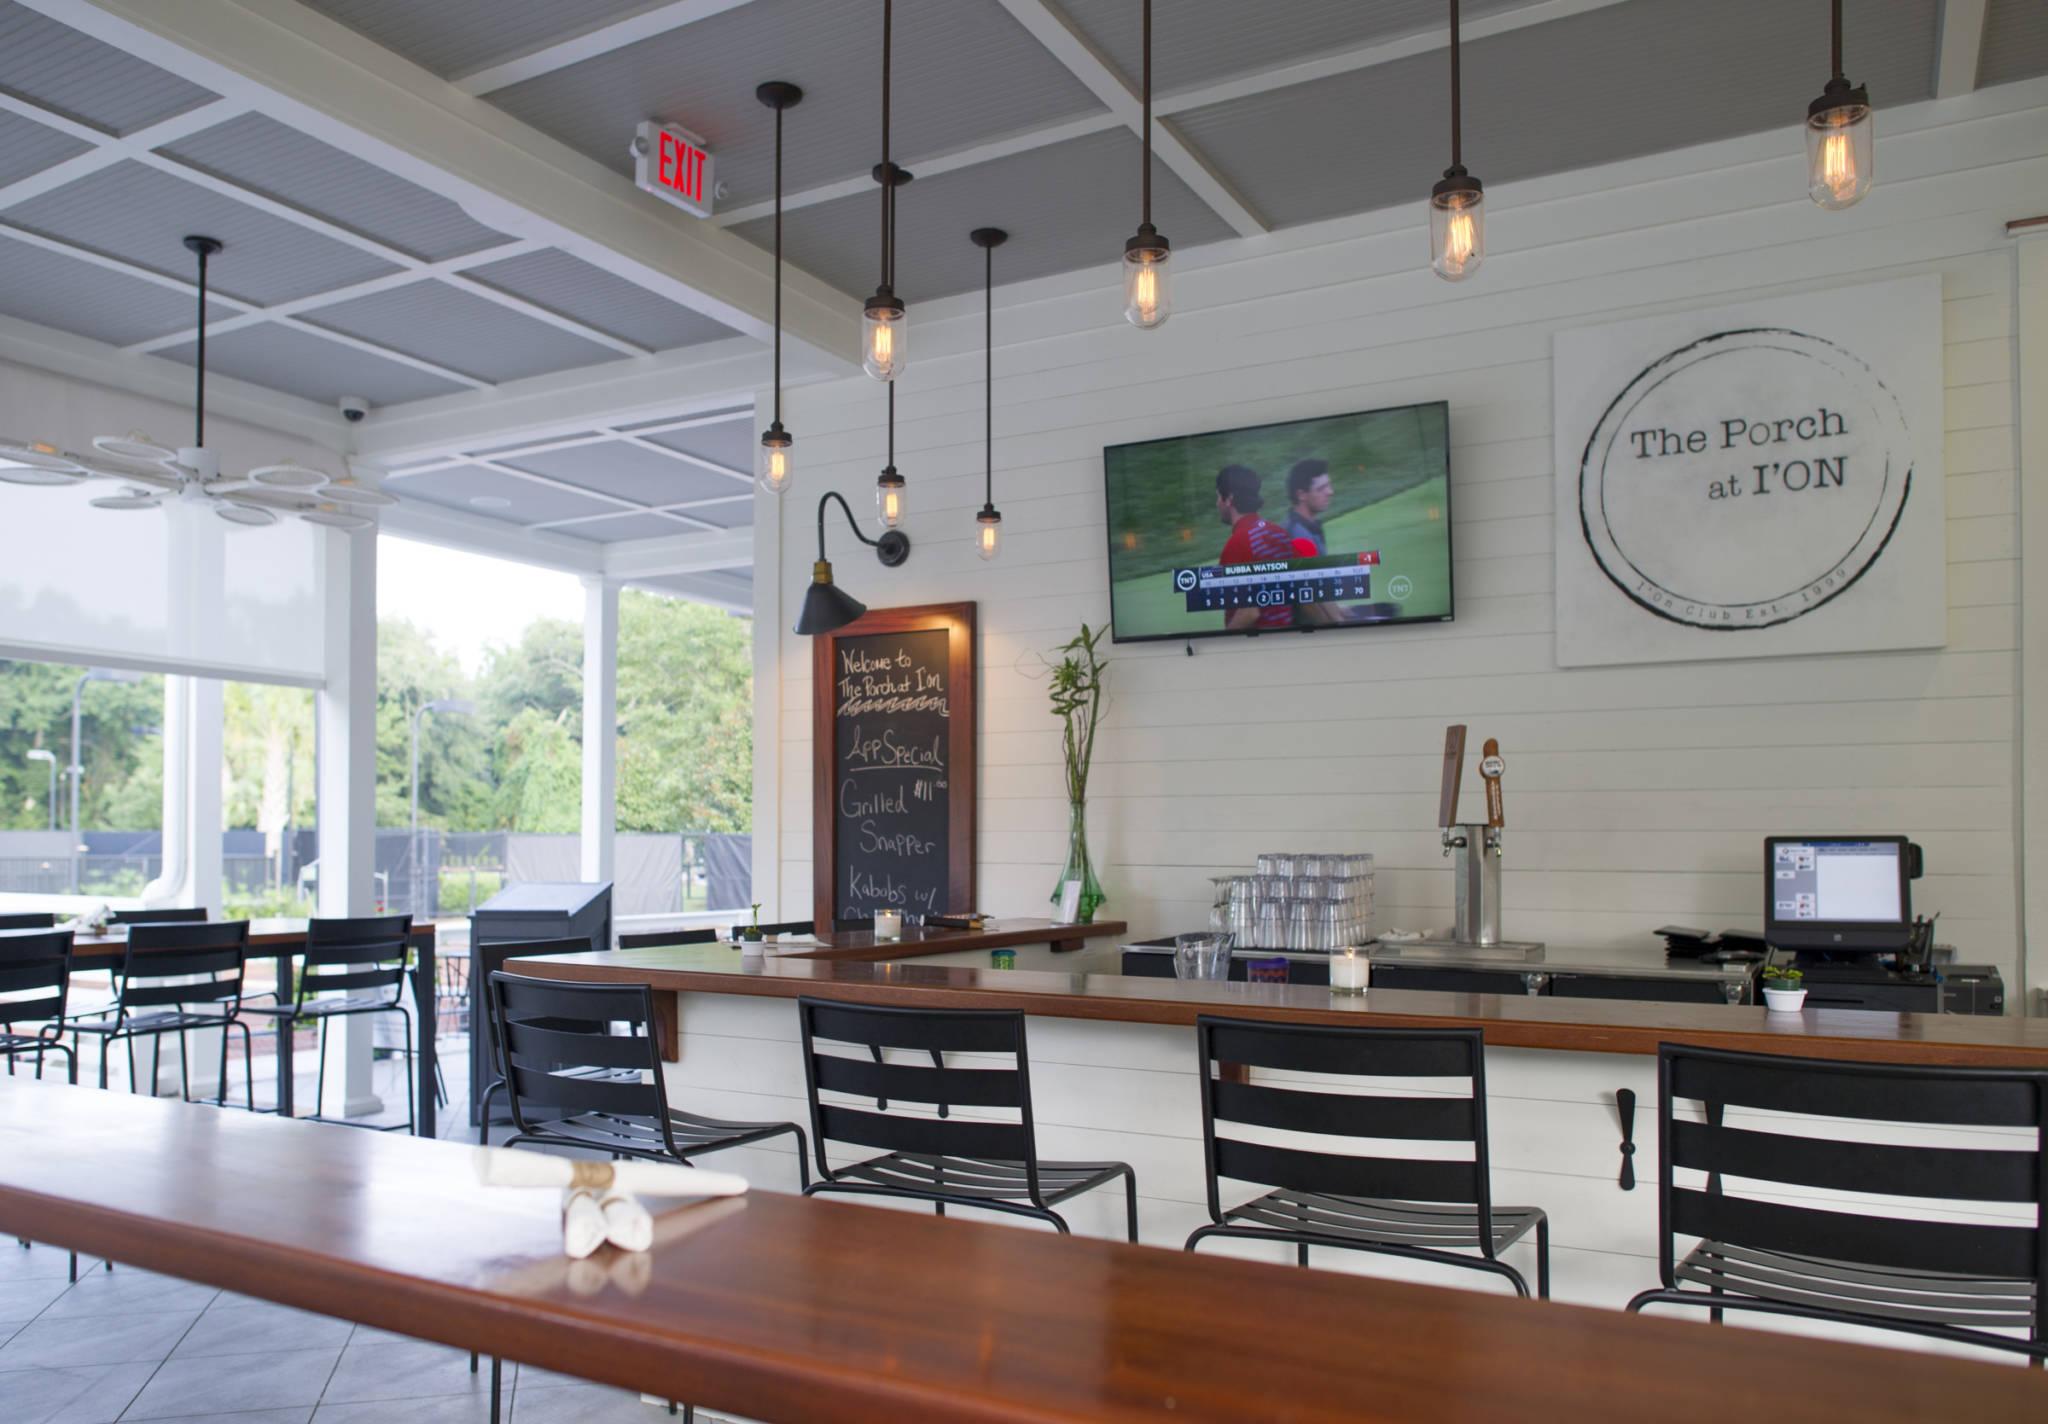 The Porch custom restaurant at Ion complex